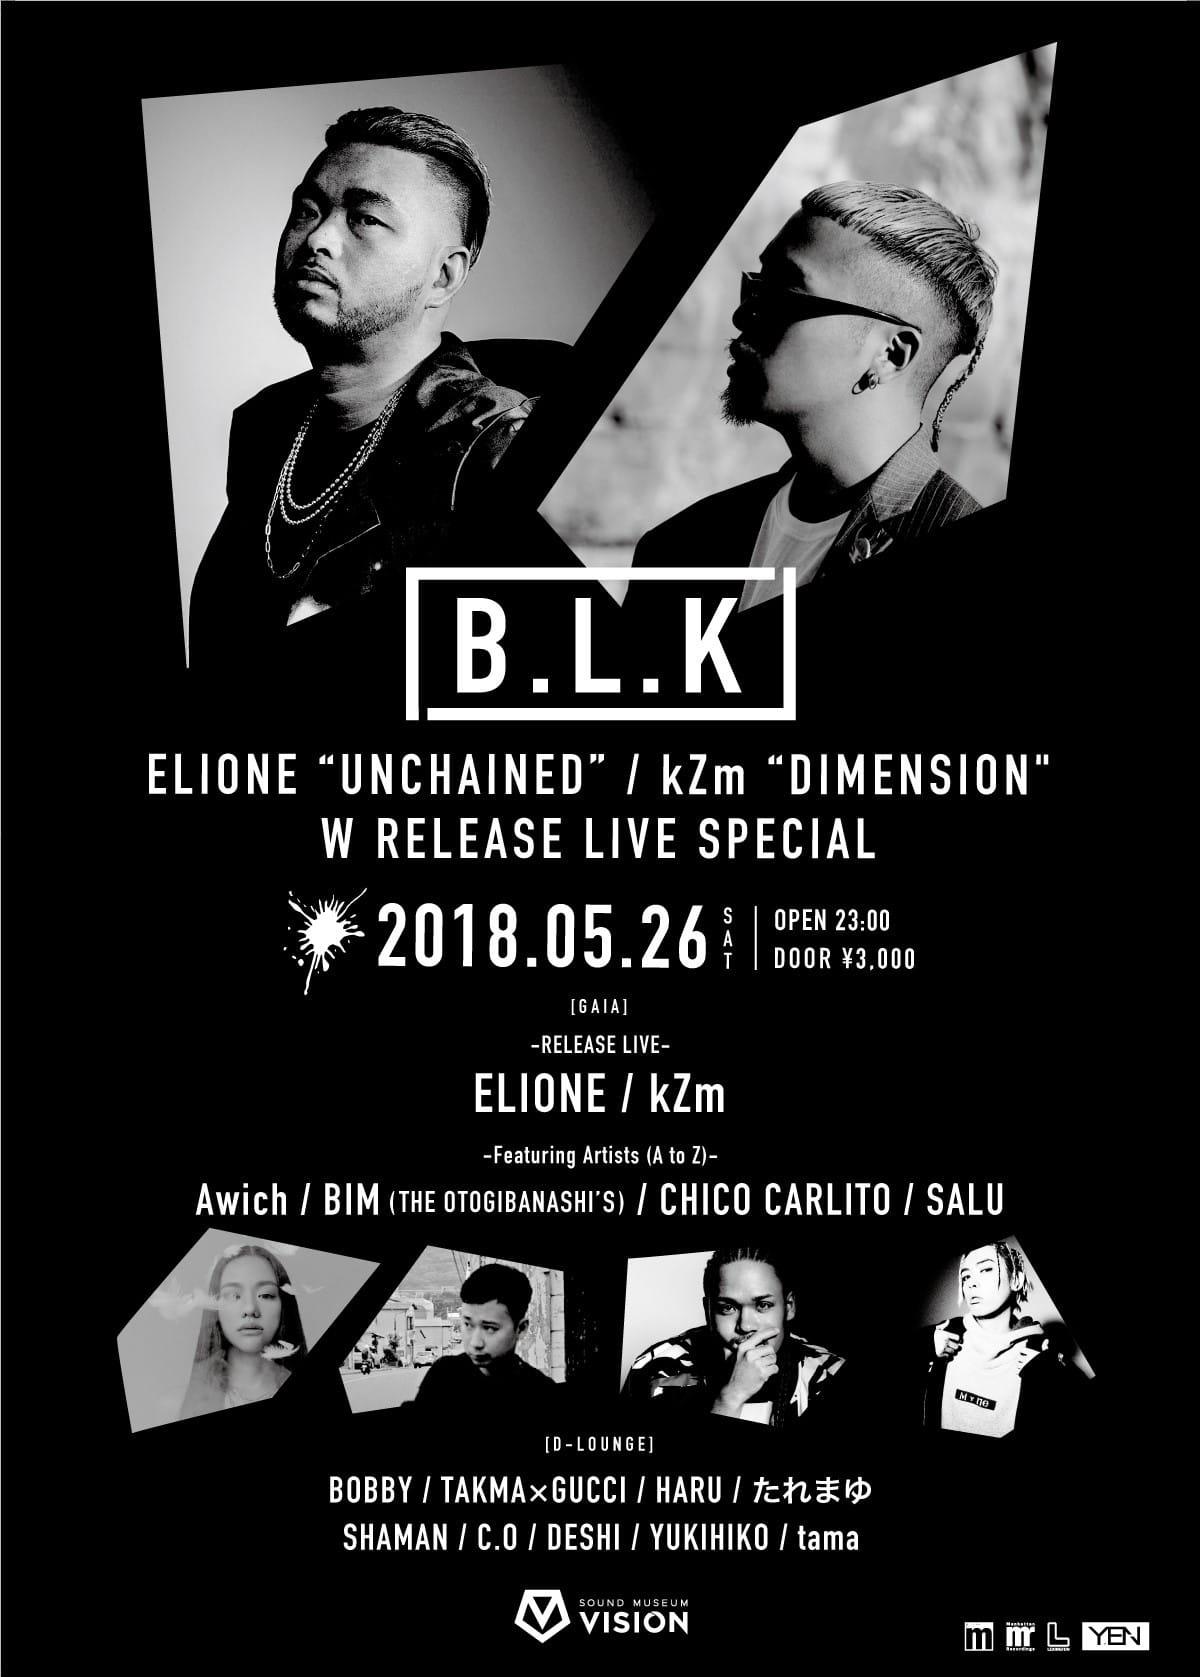 ELIONEの新作アルバム『UNCHAINED』がリリース!ELIONE × RYKEYインタビュー映像も公開! music180516_elione_1-1200x1677